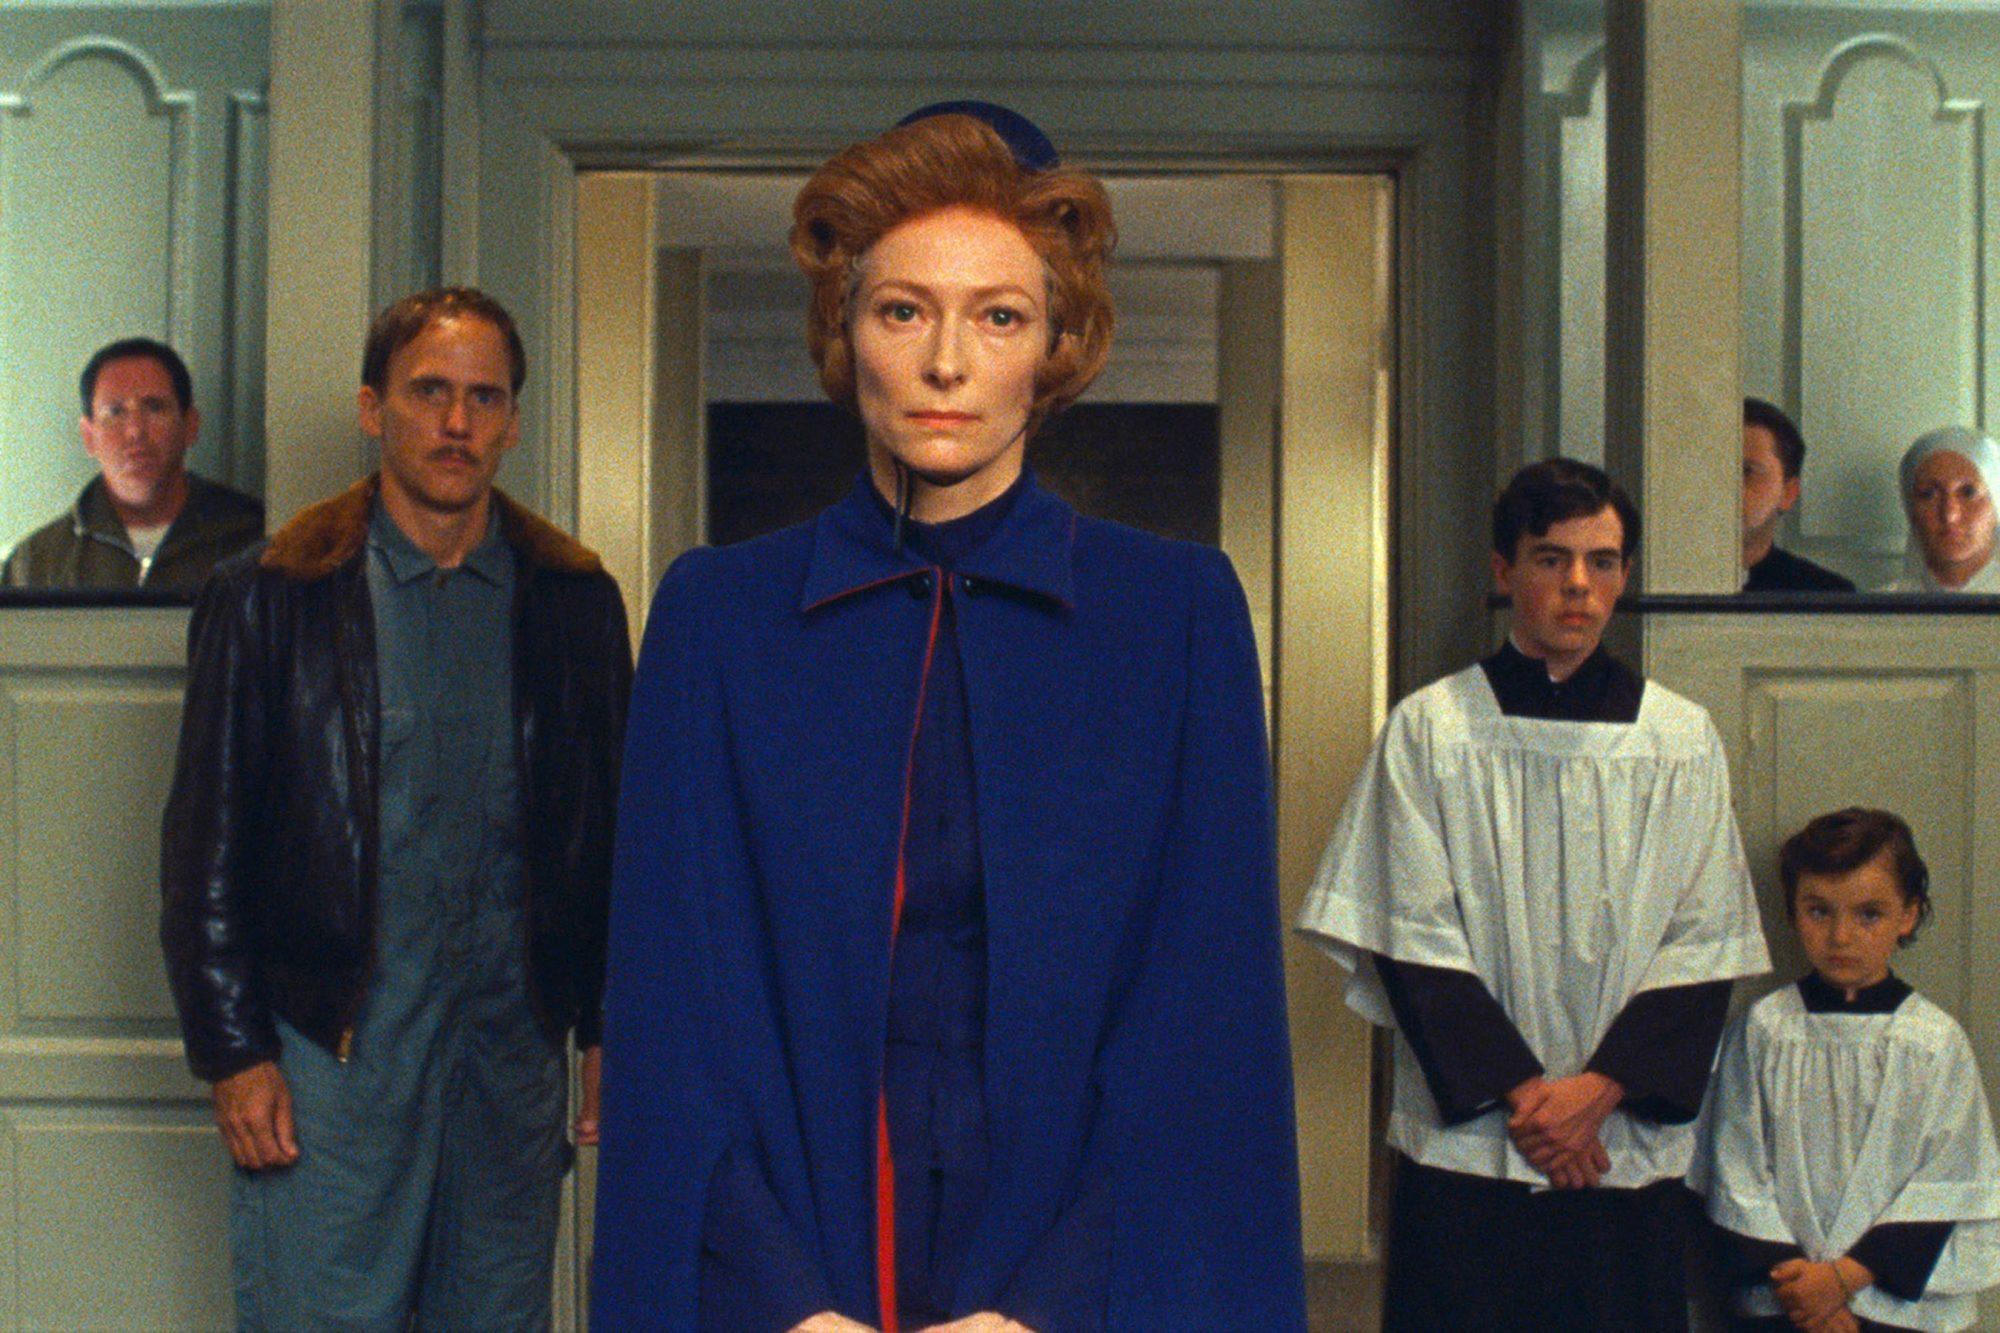 MOONRISE KINGDOM (2012)Tilda Swinton (at center) stars as Social Services